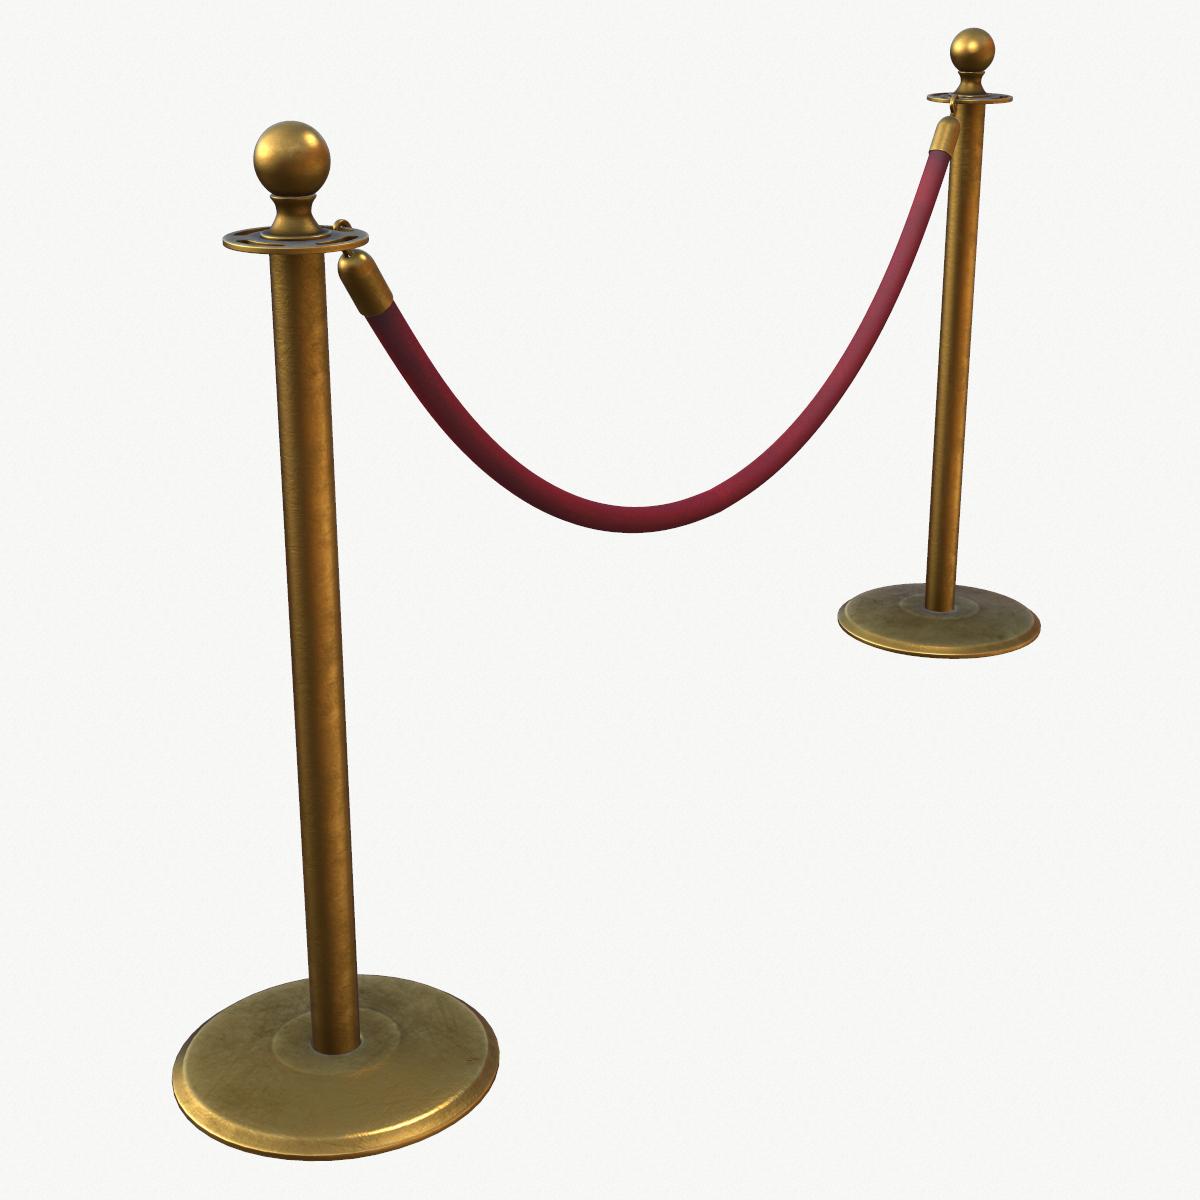 Stanchion and Velvet Rope 3D Model in Miscellaneous 3DExport.